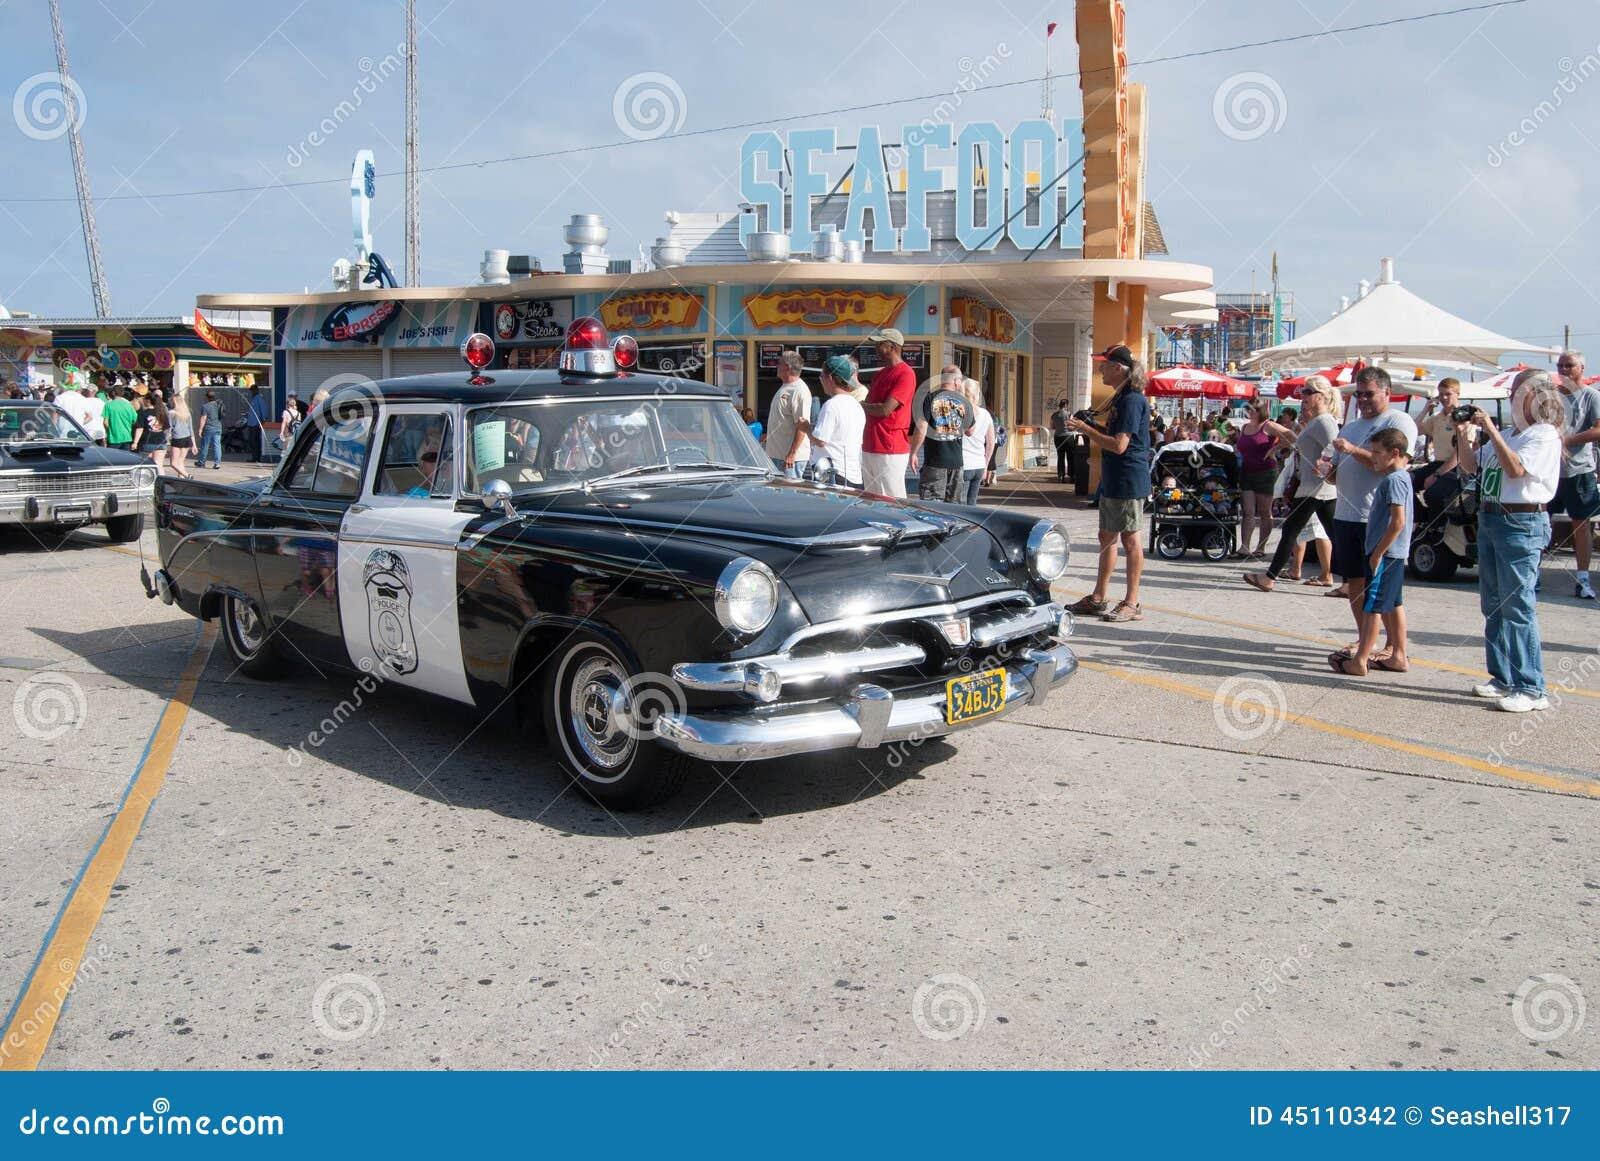 Classic Car Show Wildwood Nj